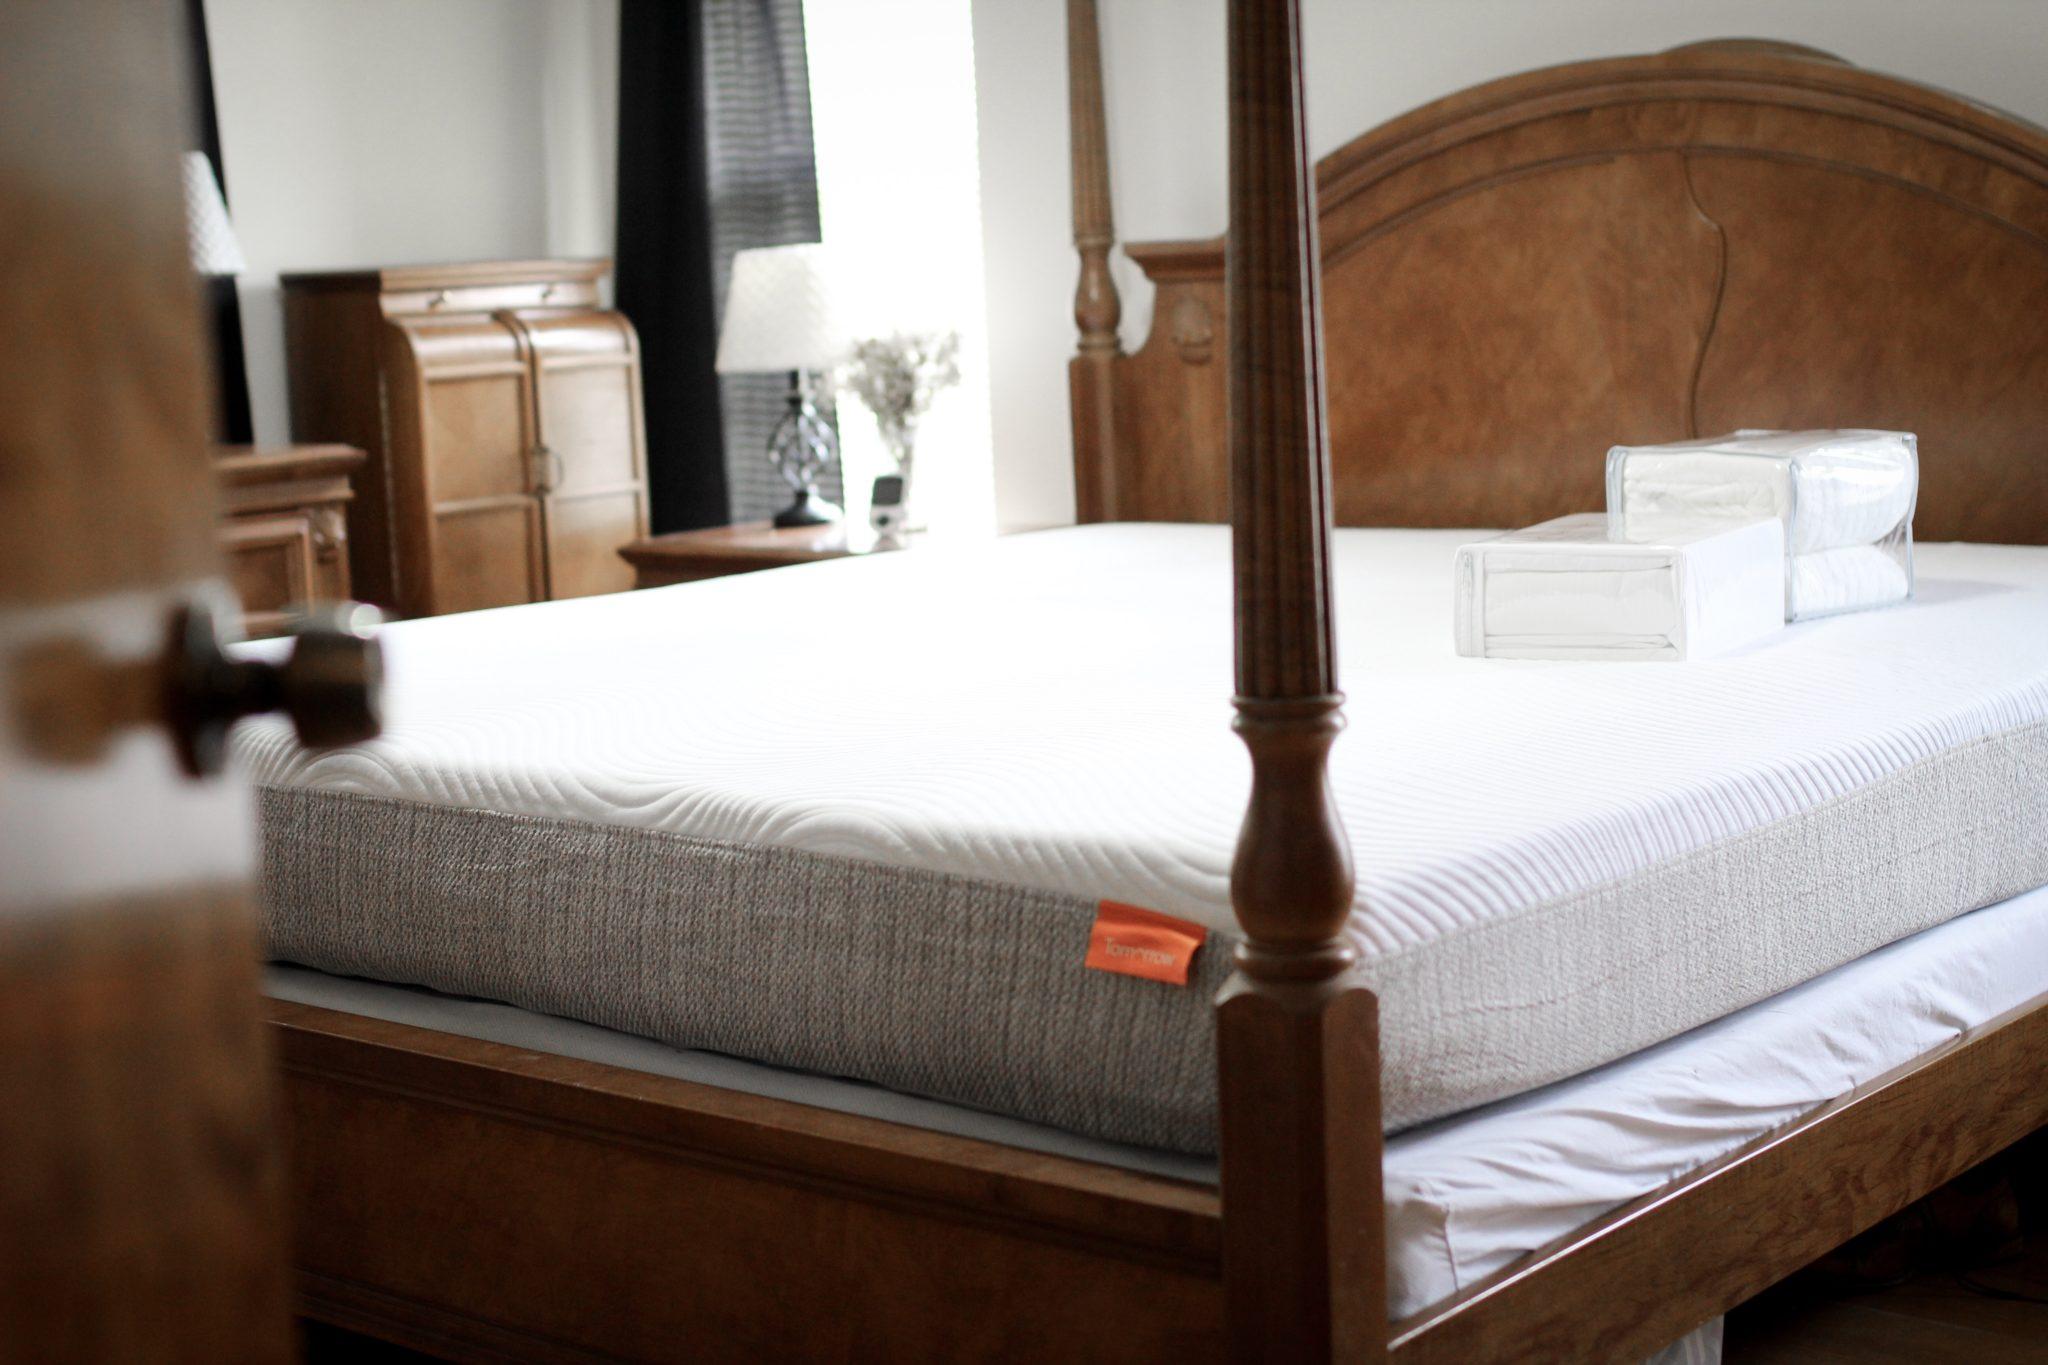 Tomorrow Sleep hybrid mattress, supima cotton sheets, memory foam mattress, tips on getting a good night's sleep